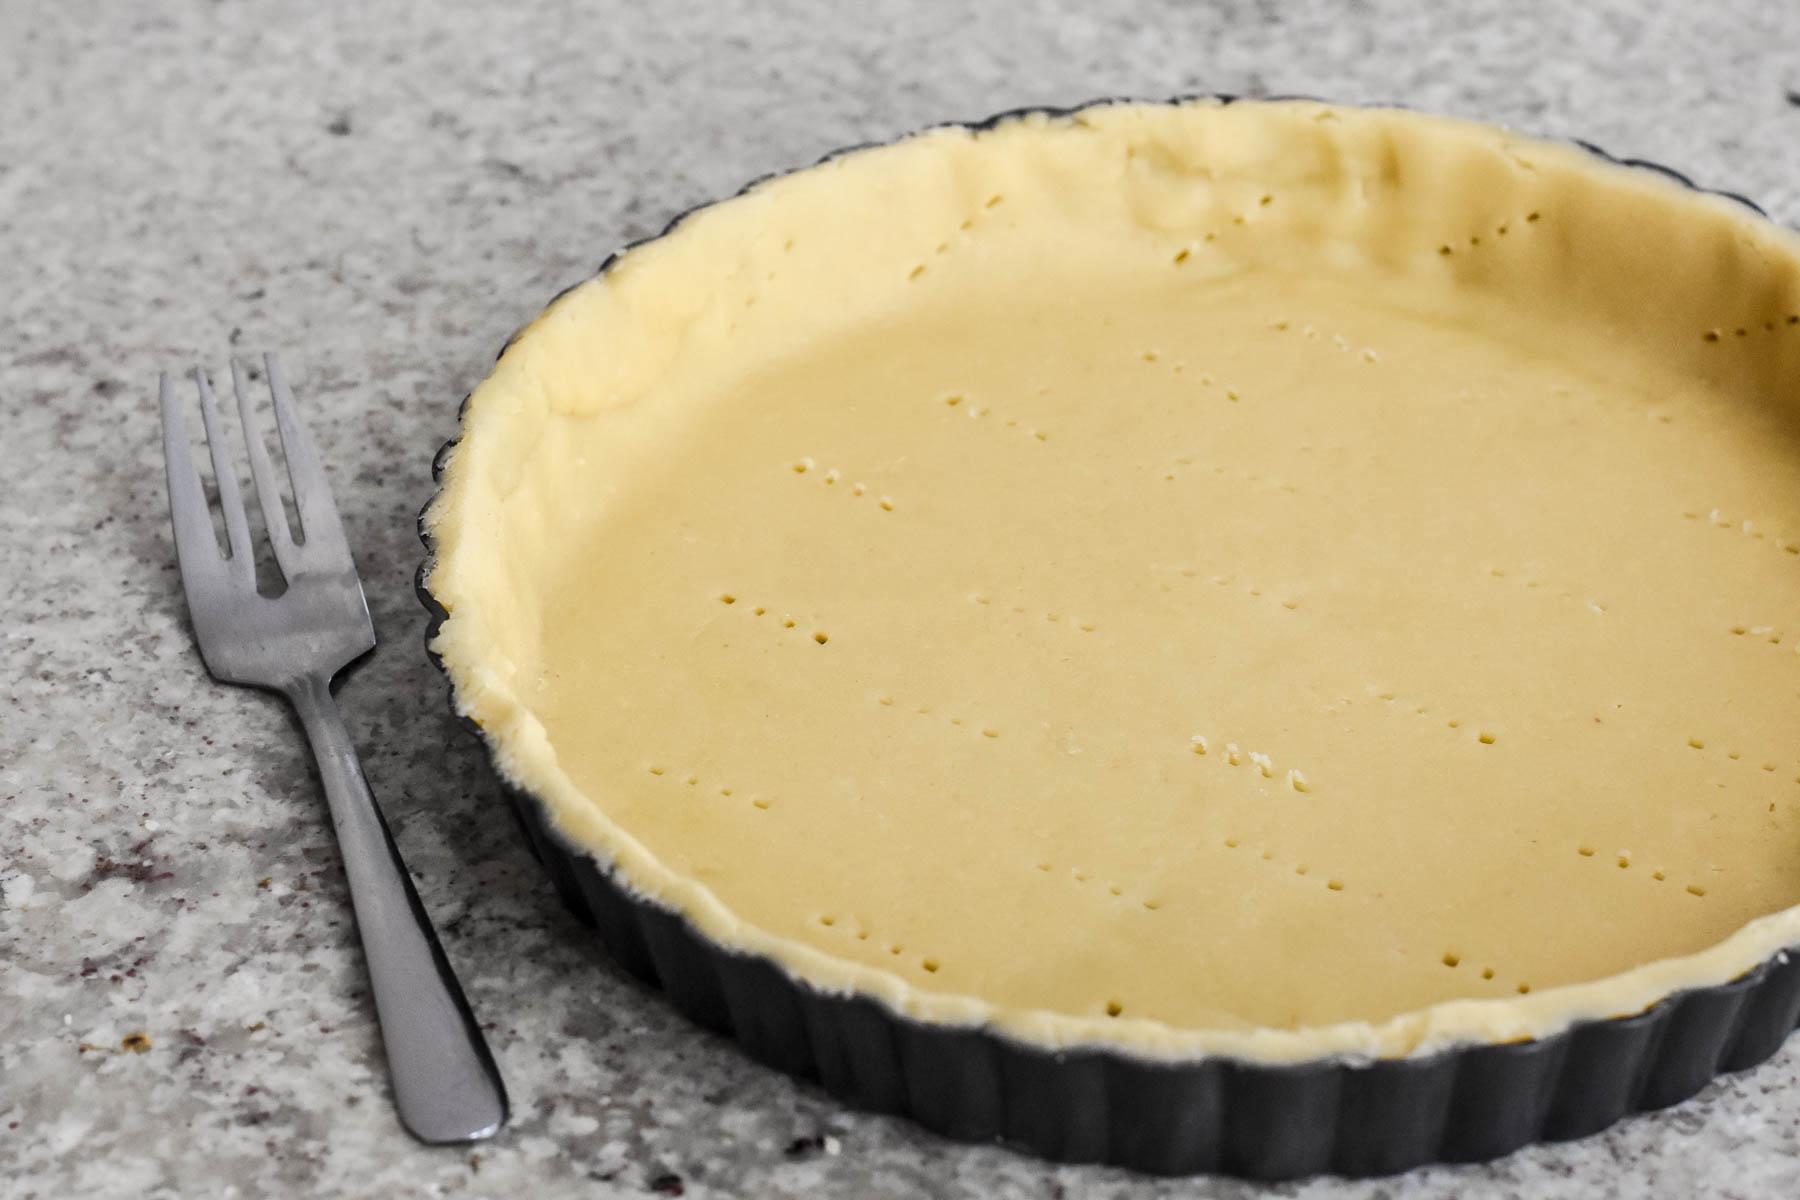 Tarte au Citron - poking holes in the pate sucree